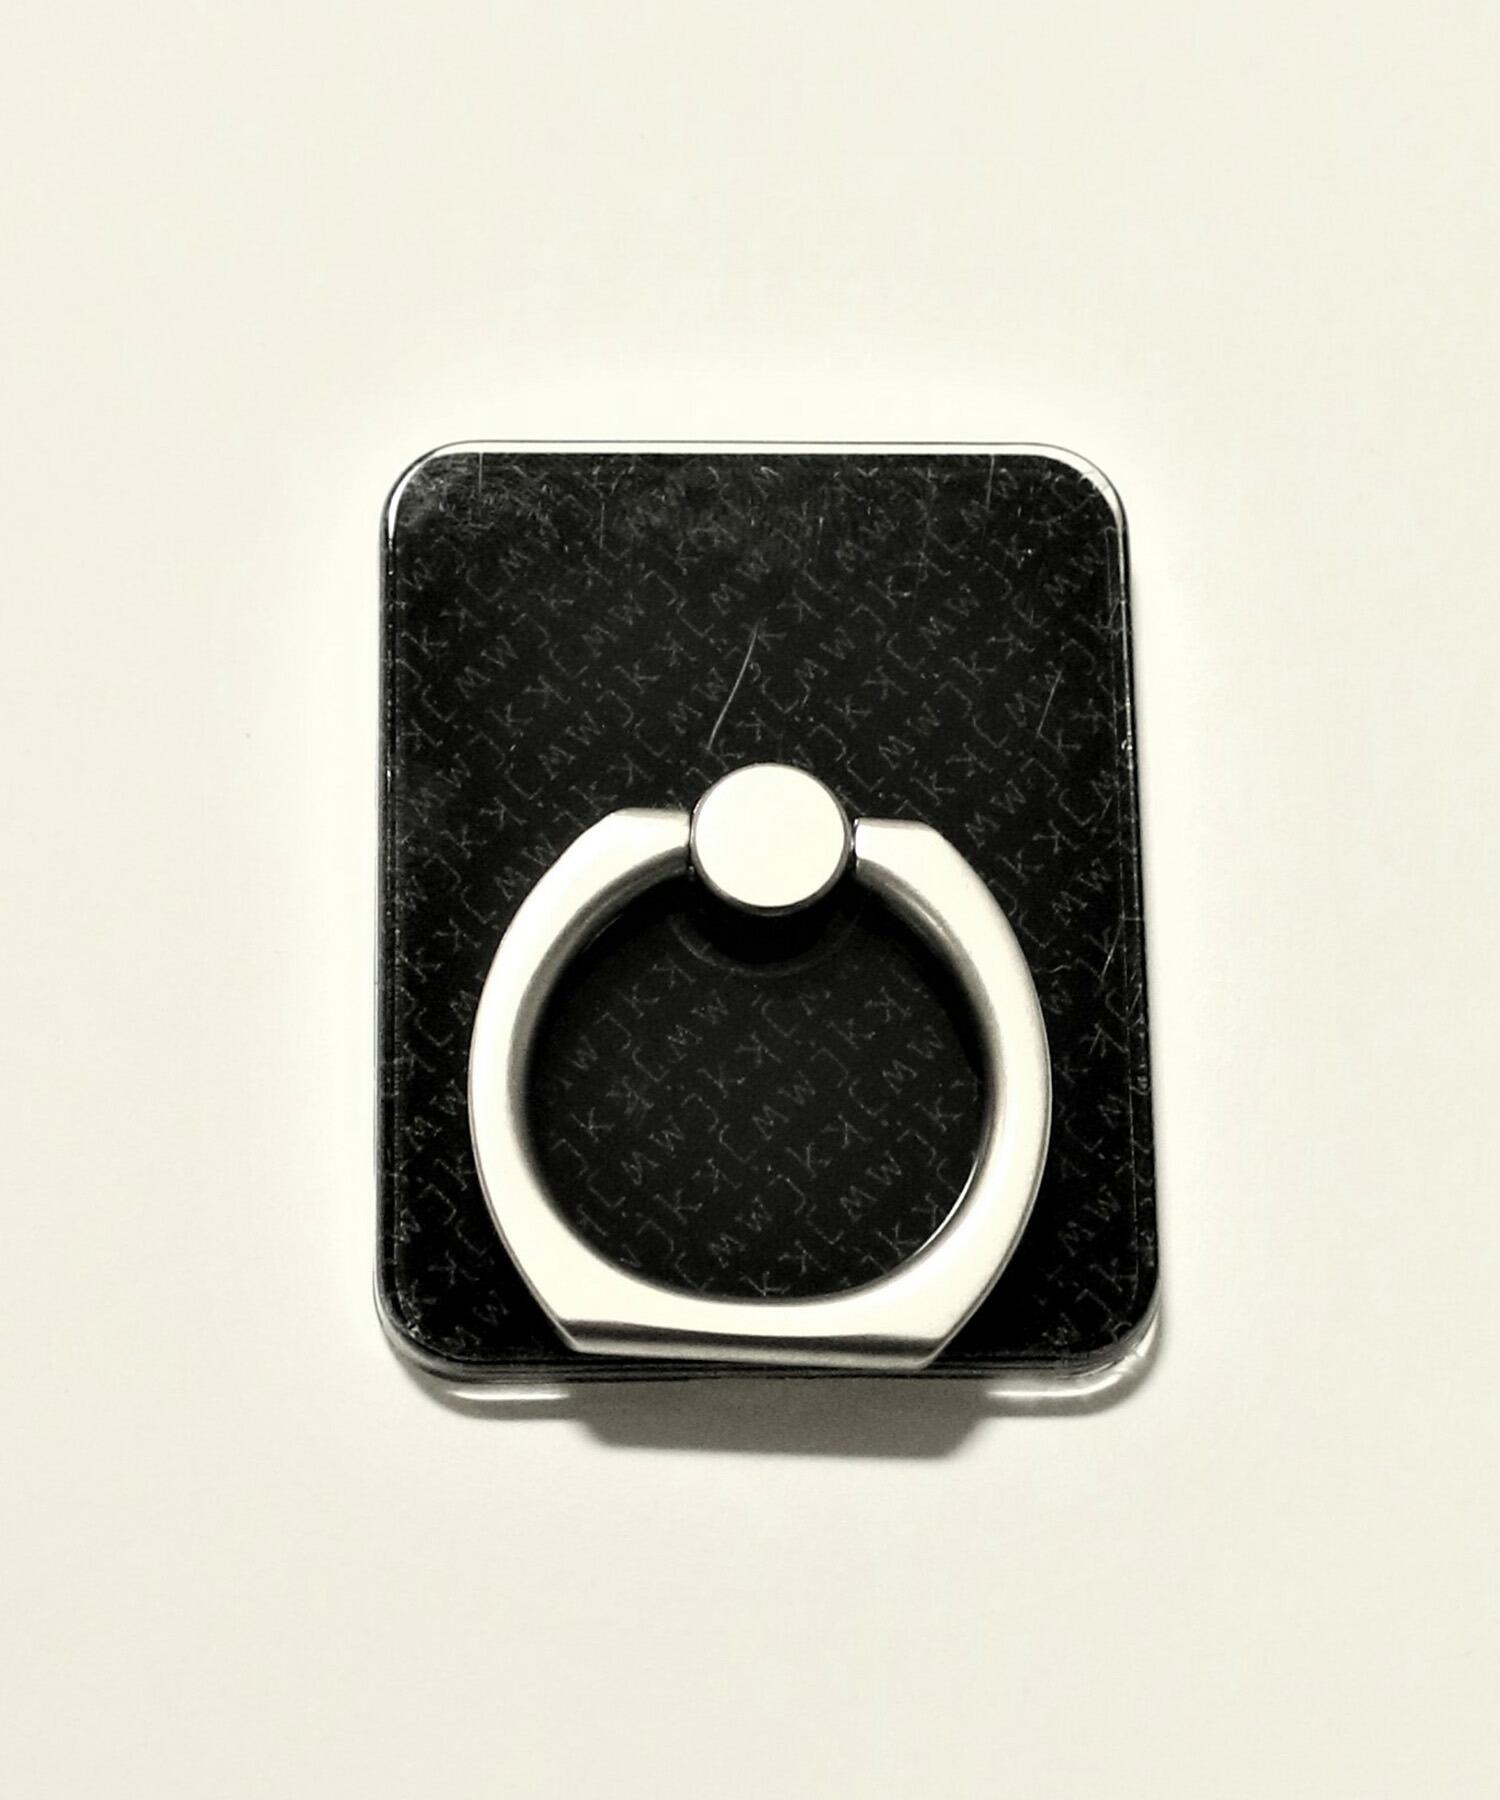 【wjk】smart phone ring(9837 sr01r)